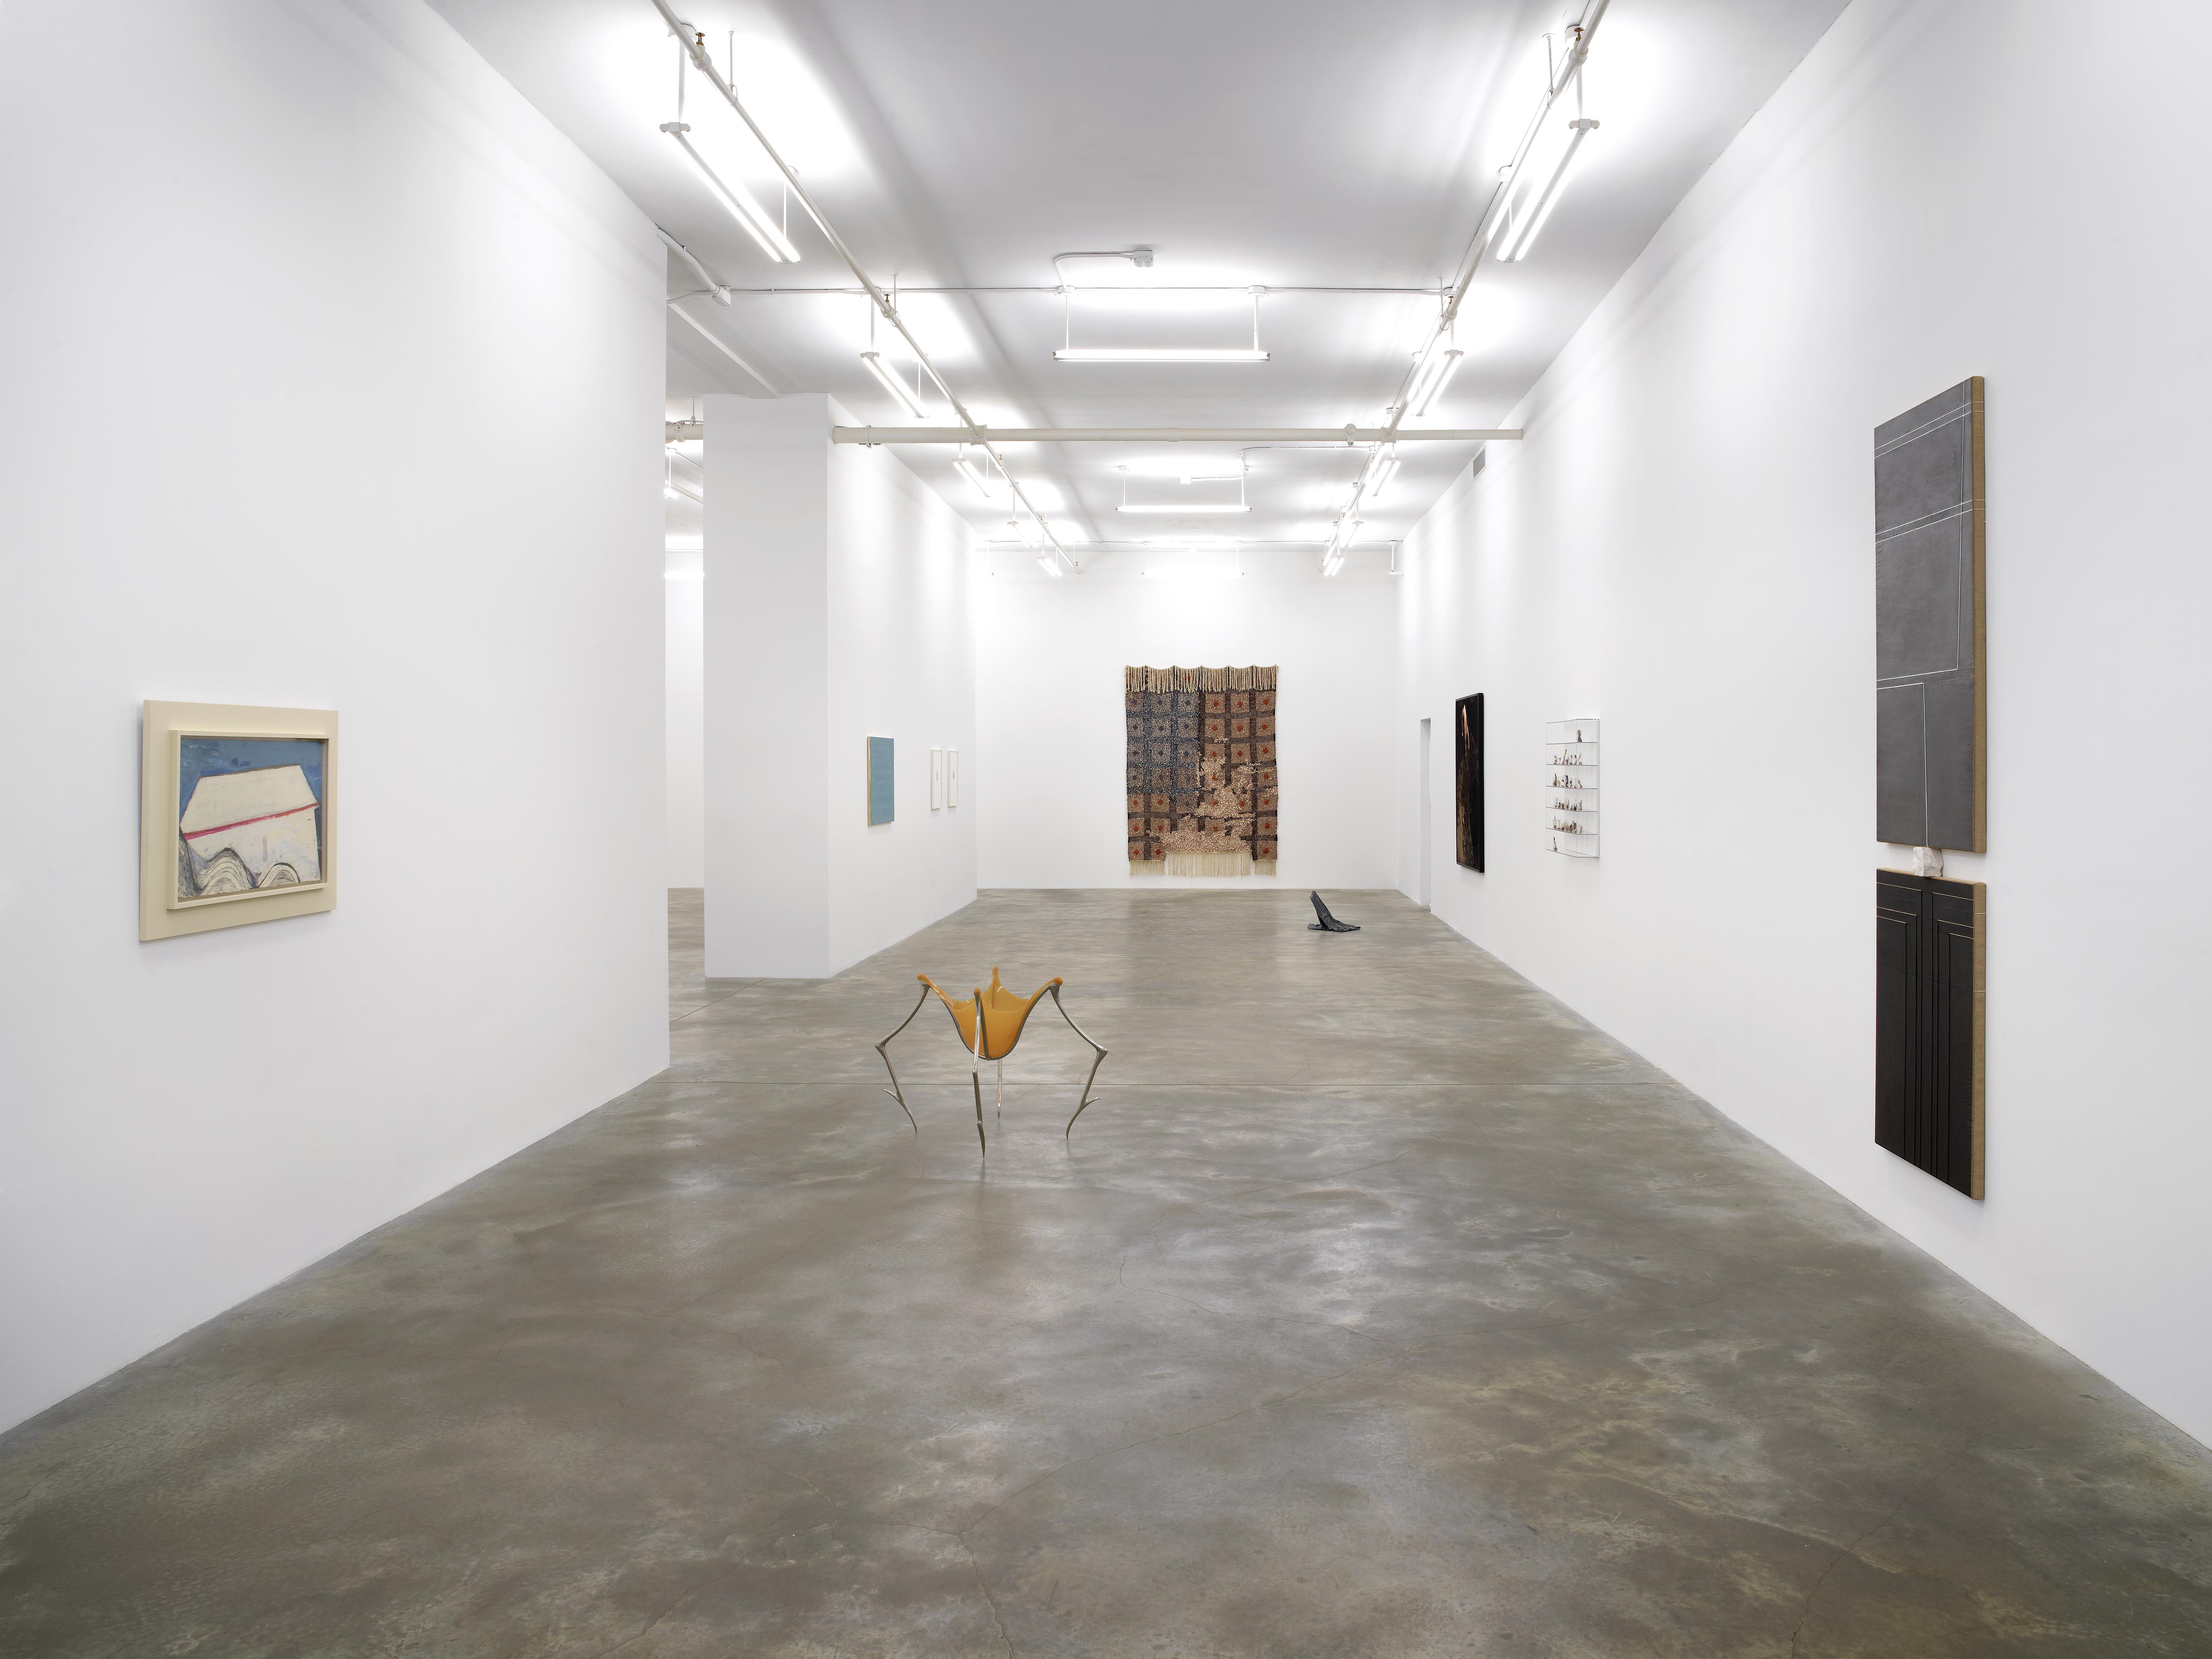 Installation view: Where the Threads Are Worn, March 18 - April 24, 2021, Casey Kaplan, New York, Photo: Dario Lasagni